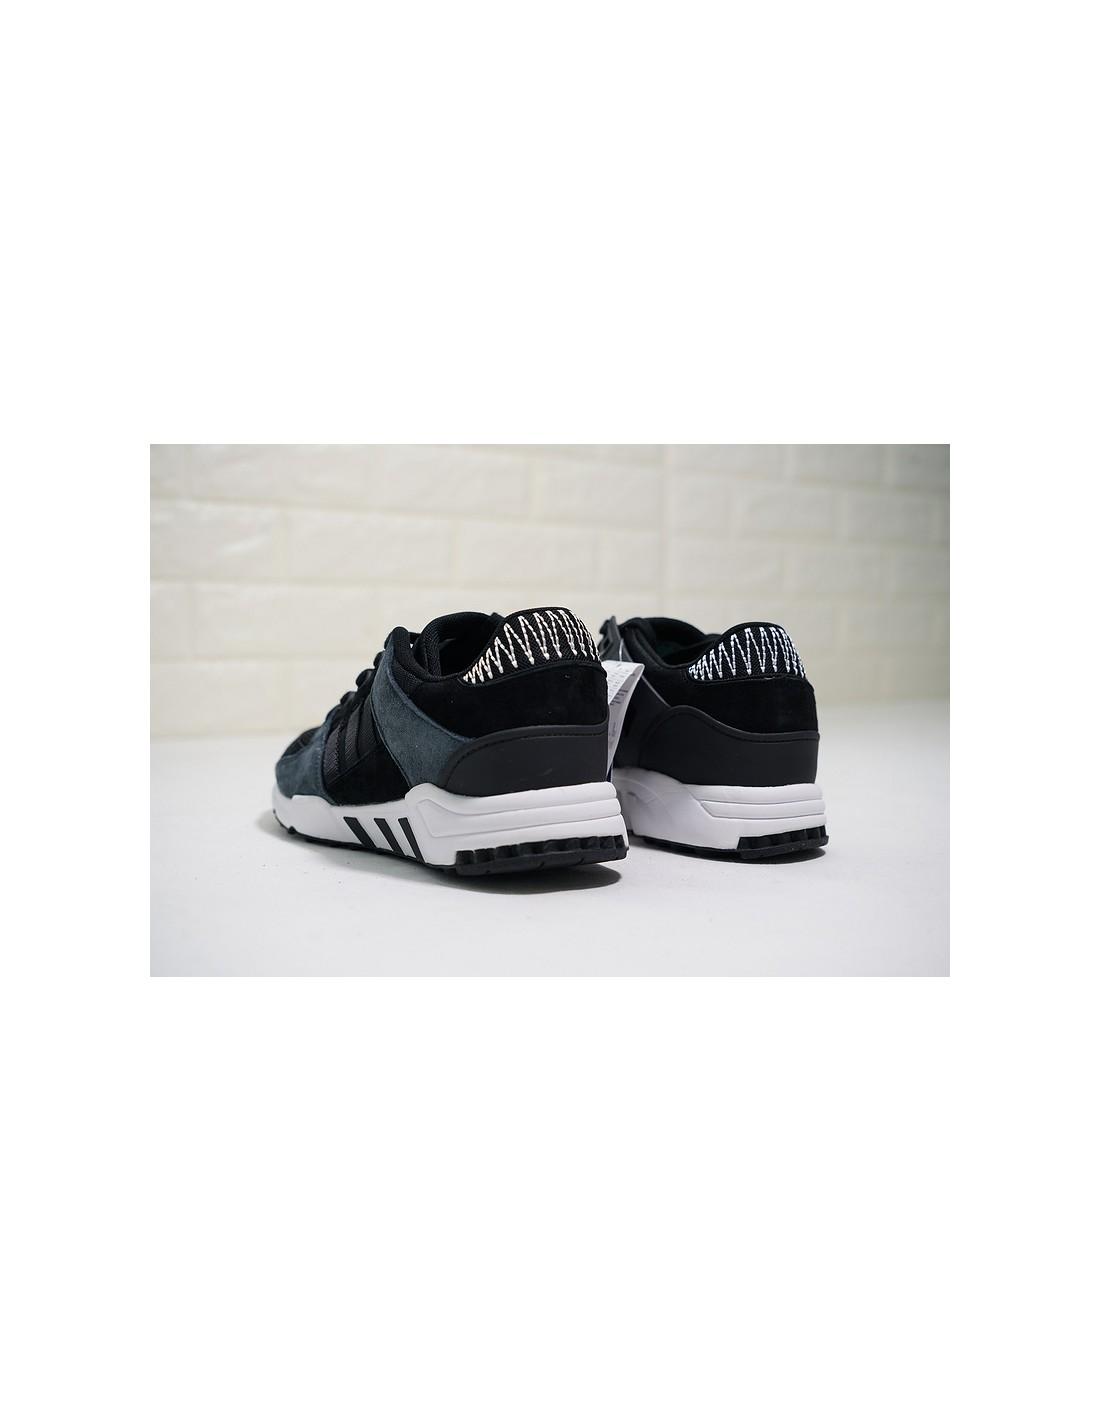 adidas EQT Support RF shoes white black